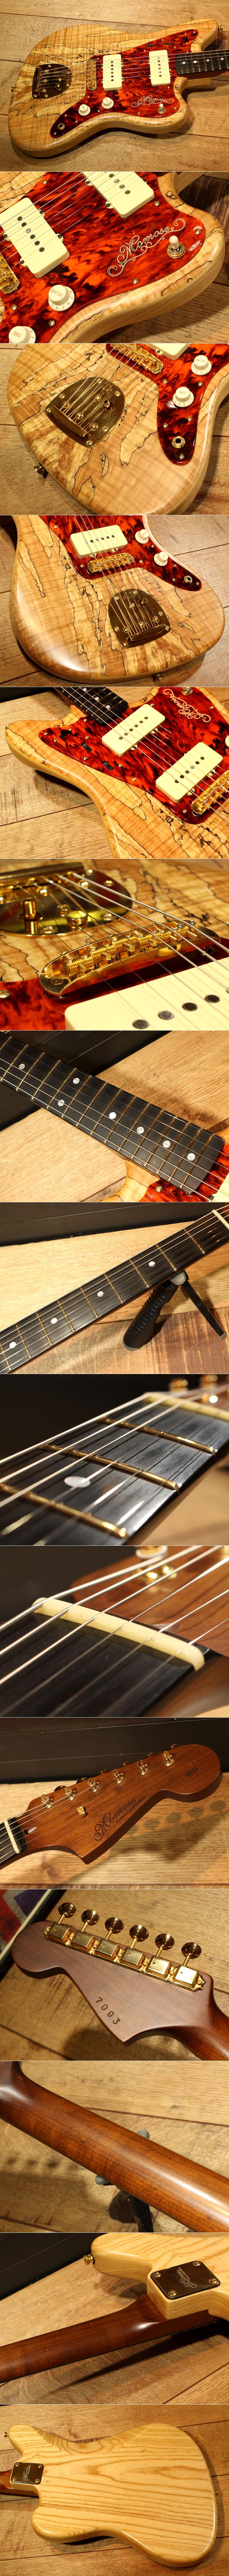 Momose Custom Craft Guitars - MJM-SM/GF MAT C-NA◆2016年楽器フェアモデル(限定3本)◆Jazzmaster◆Spalted Maple&Ash1P◆美品 15703001